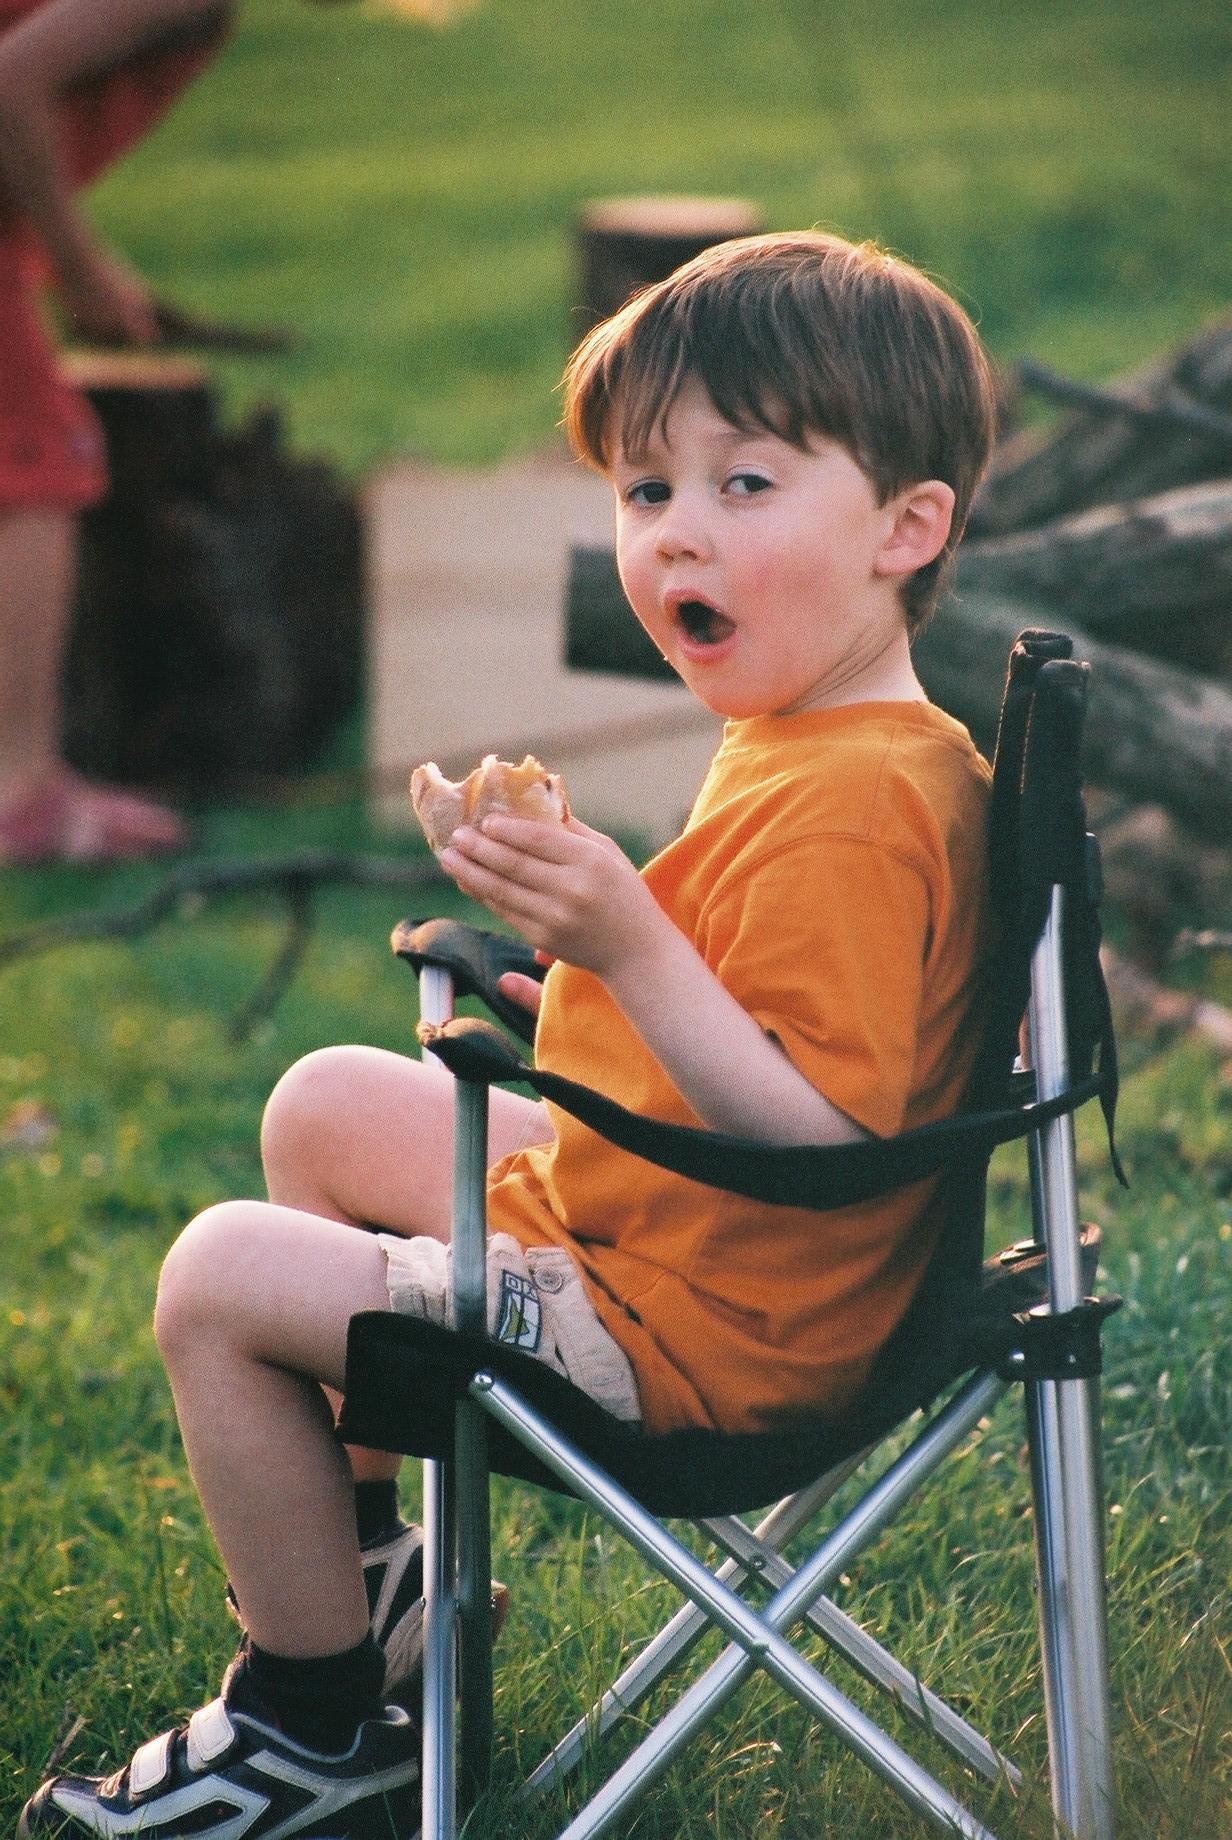 Boy at Barbecue.JPG